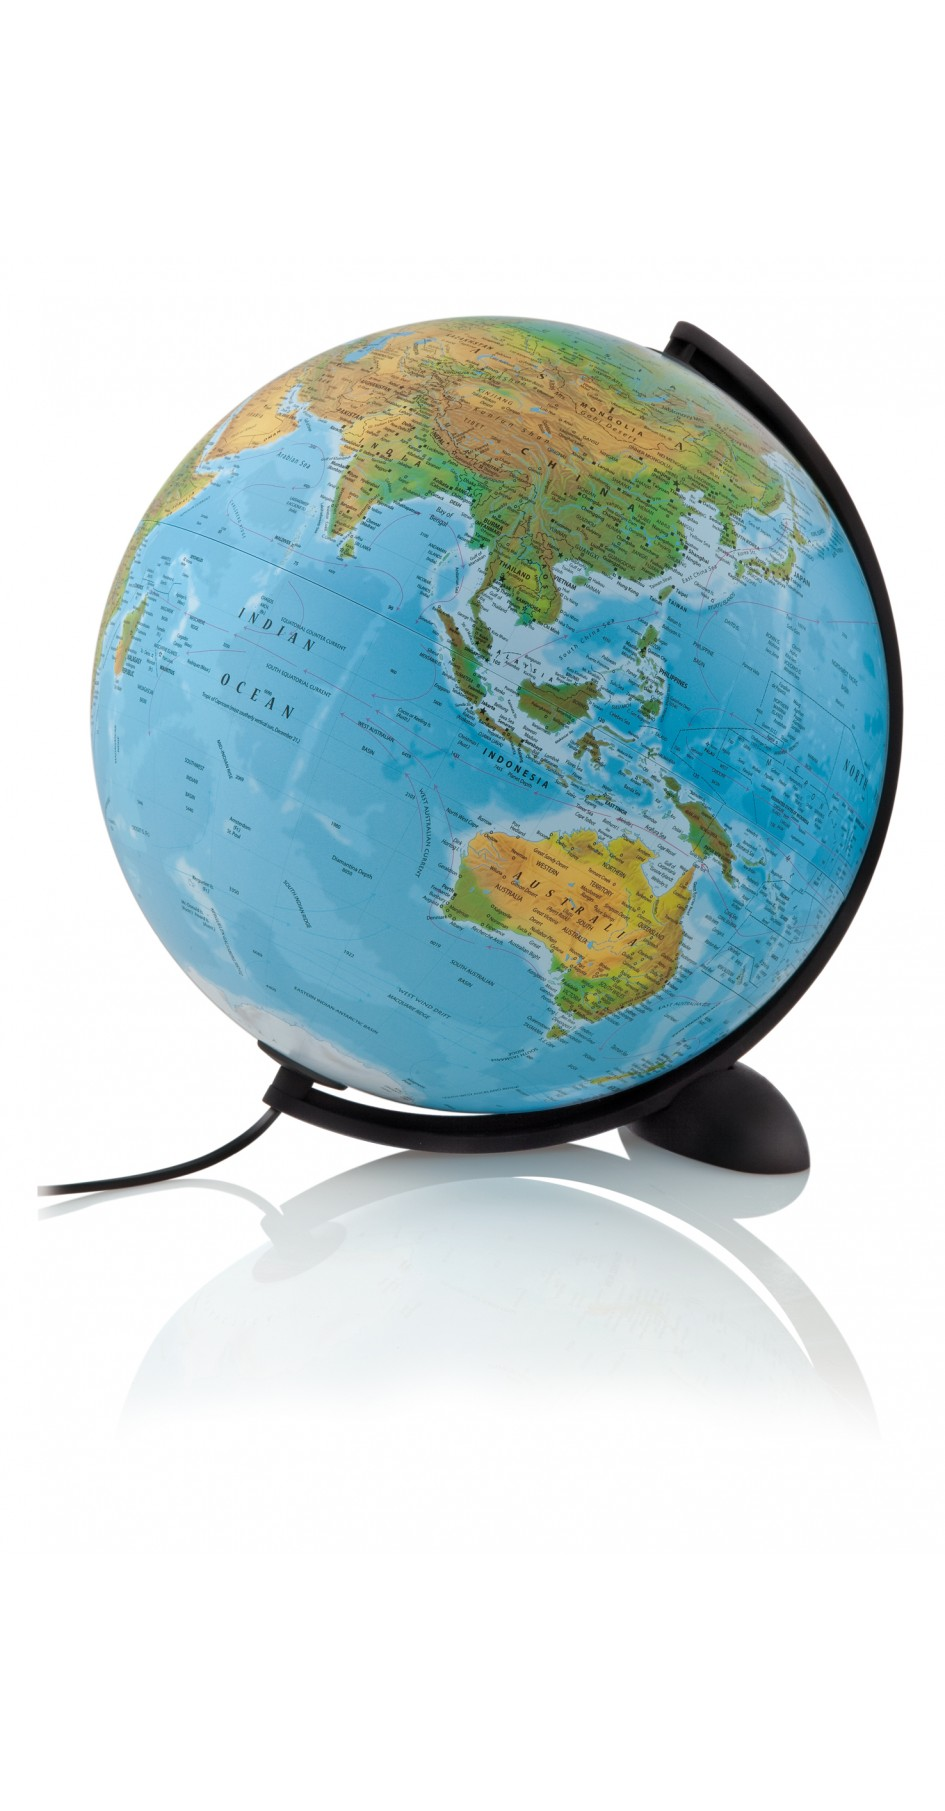 Ellipse globe 30 cm physical / political (blue)